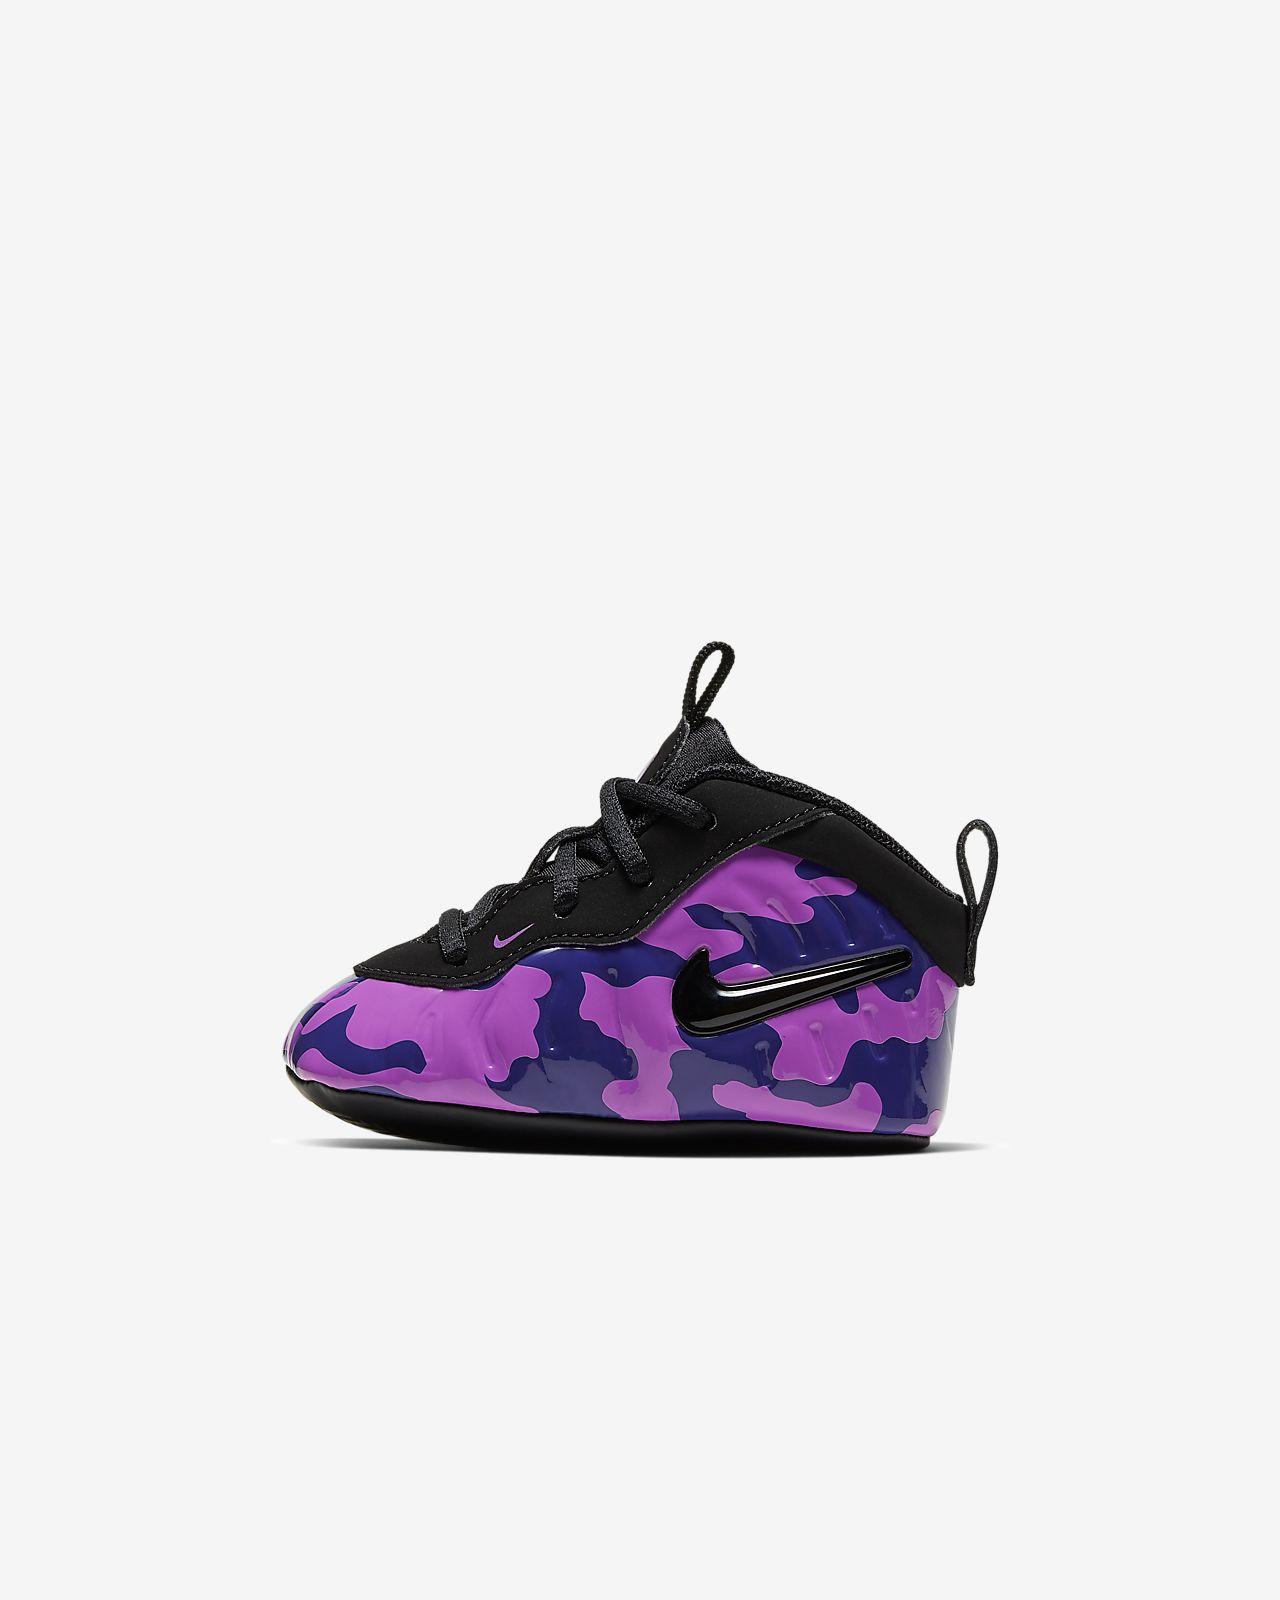 1f2122e830b9c Nike Lil' Posite Pro Infant/Toddler Bootie